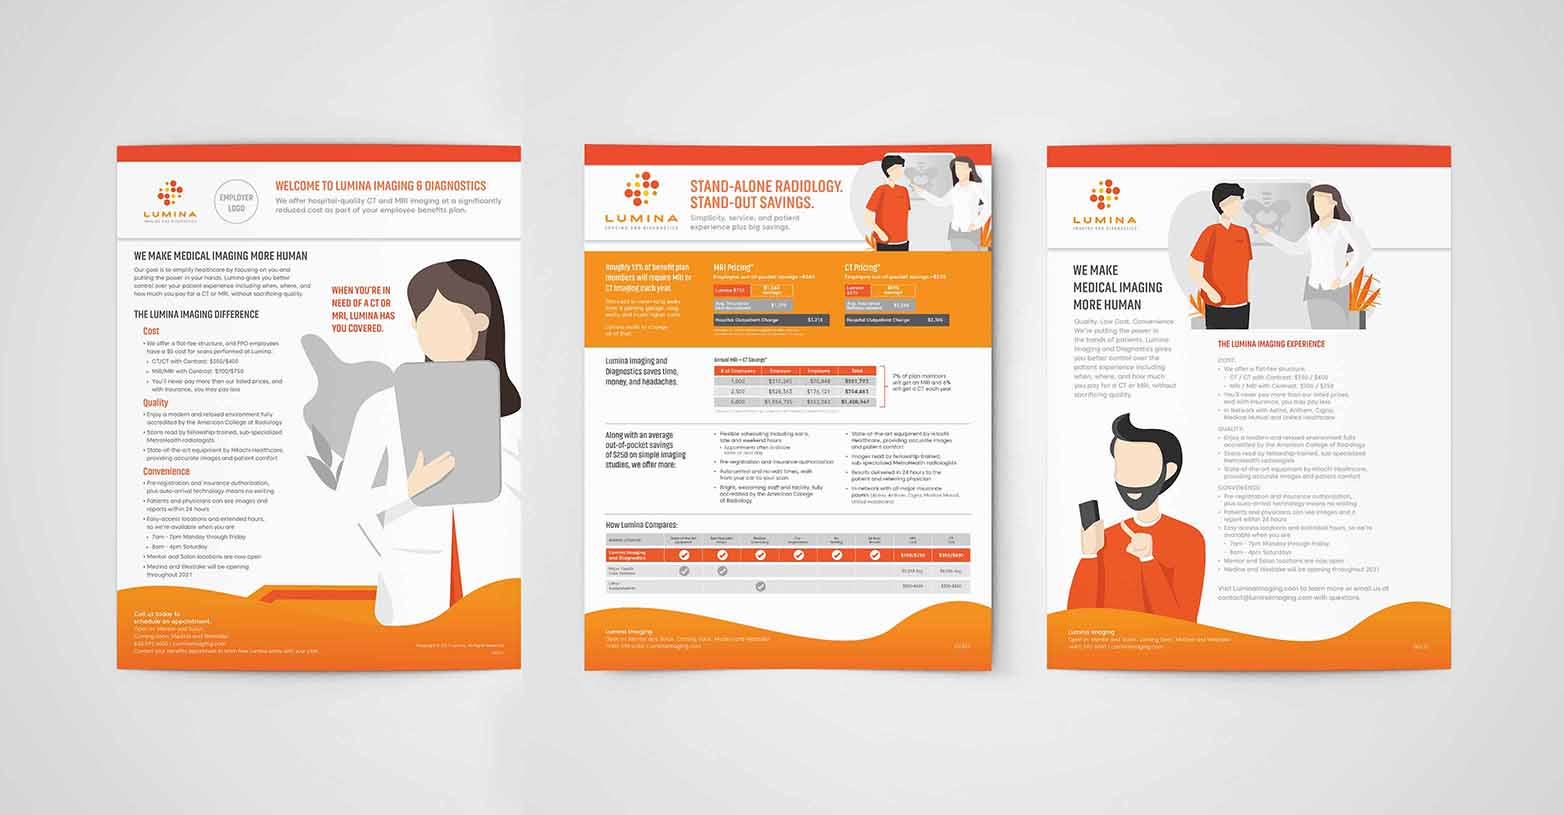 Lumina Imaging flyers produced for large employers